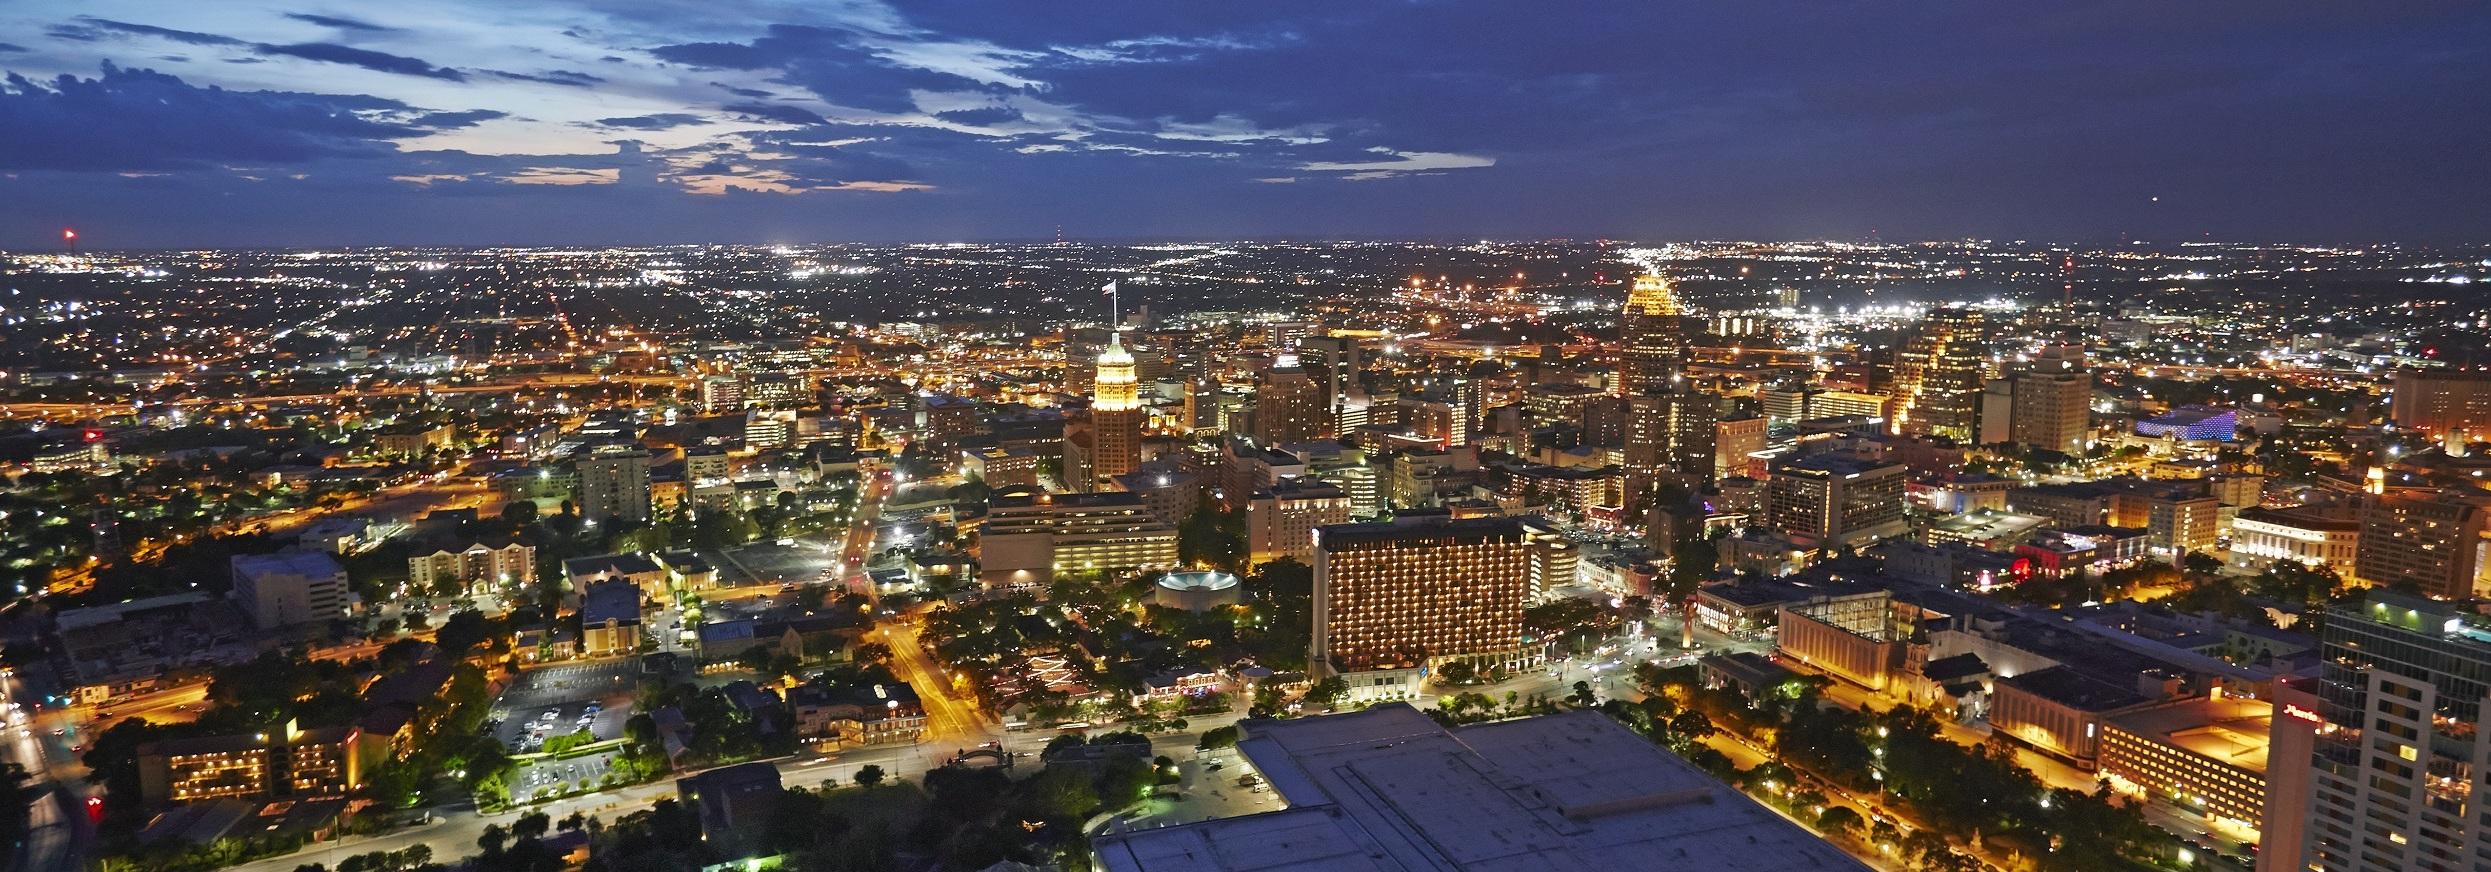 Elevated cityscape of dowtown San Antonio